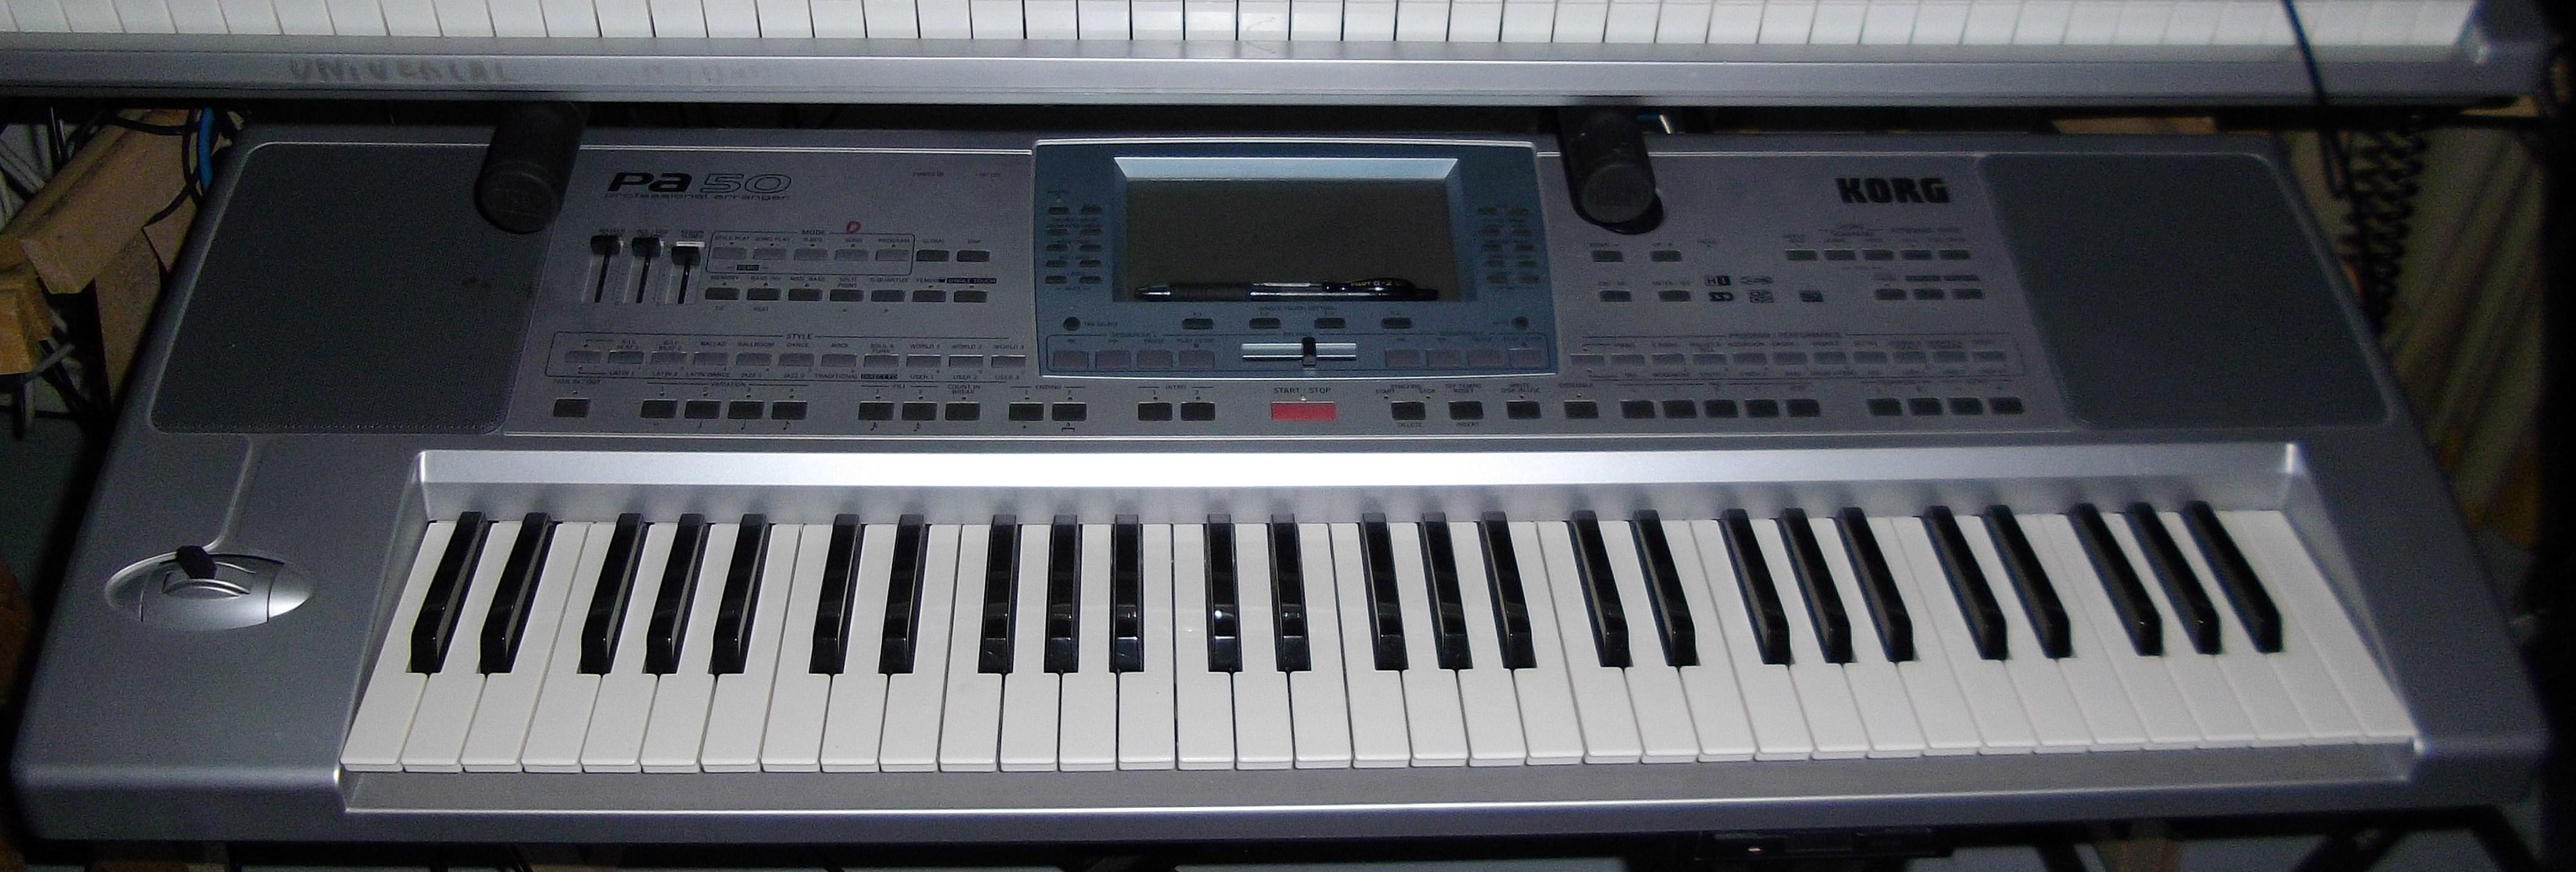 KORG PA - Style set 1 - Keyboardist Sharing